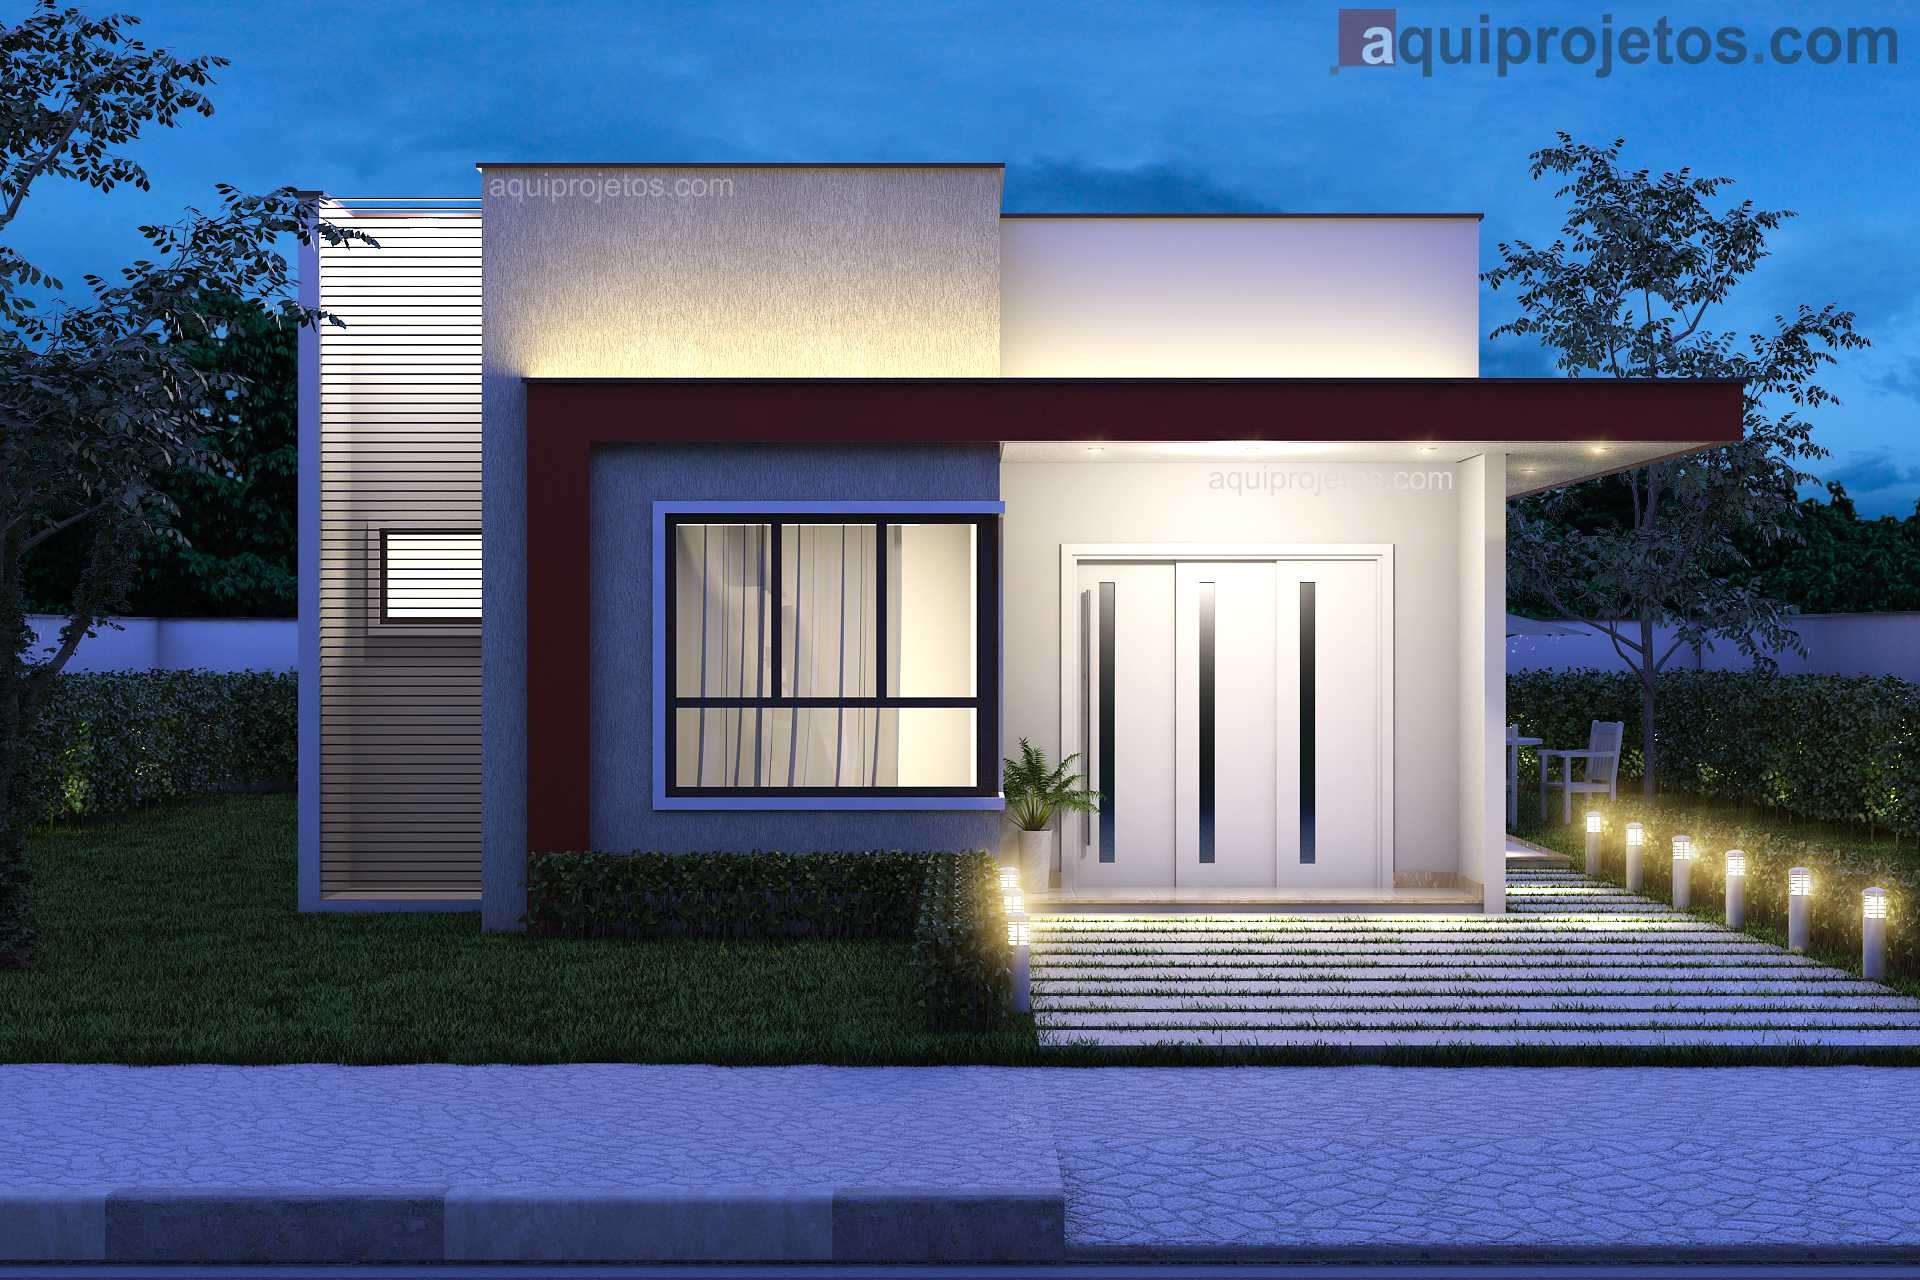 Fachada moderna frontal noturna iluminação casa 1 andar - Projeto Maceió - Cod G13 – aquiprojetos